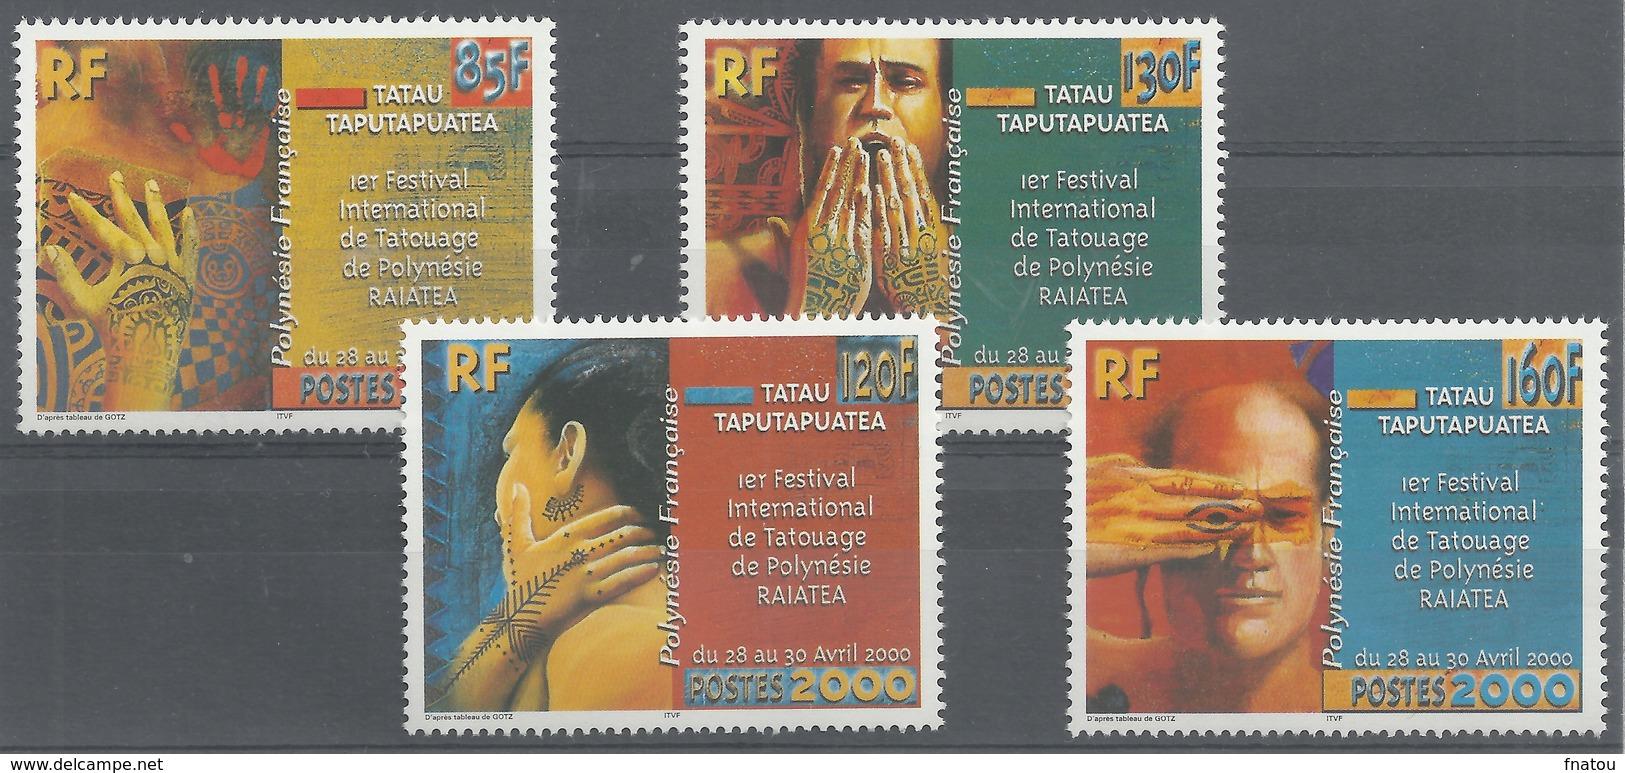 French Polynesia, Tatoo Festival, Raiatea (Society Islands), 2000, MNH VF - French Polynesia